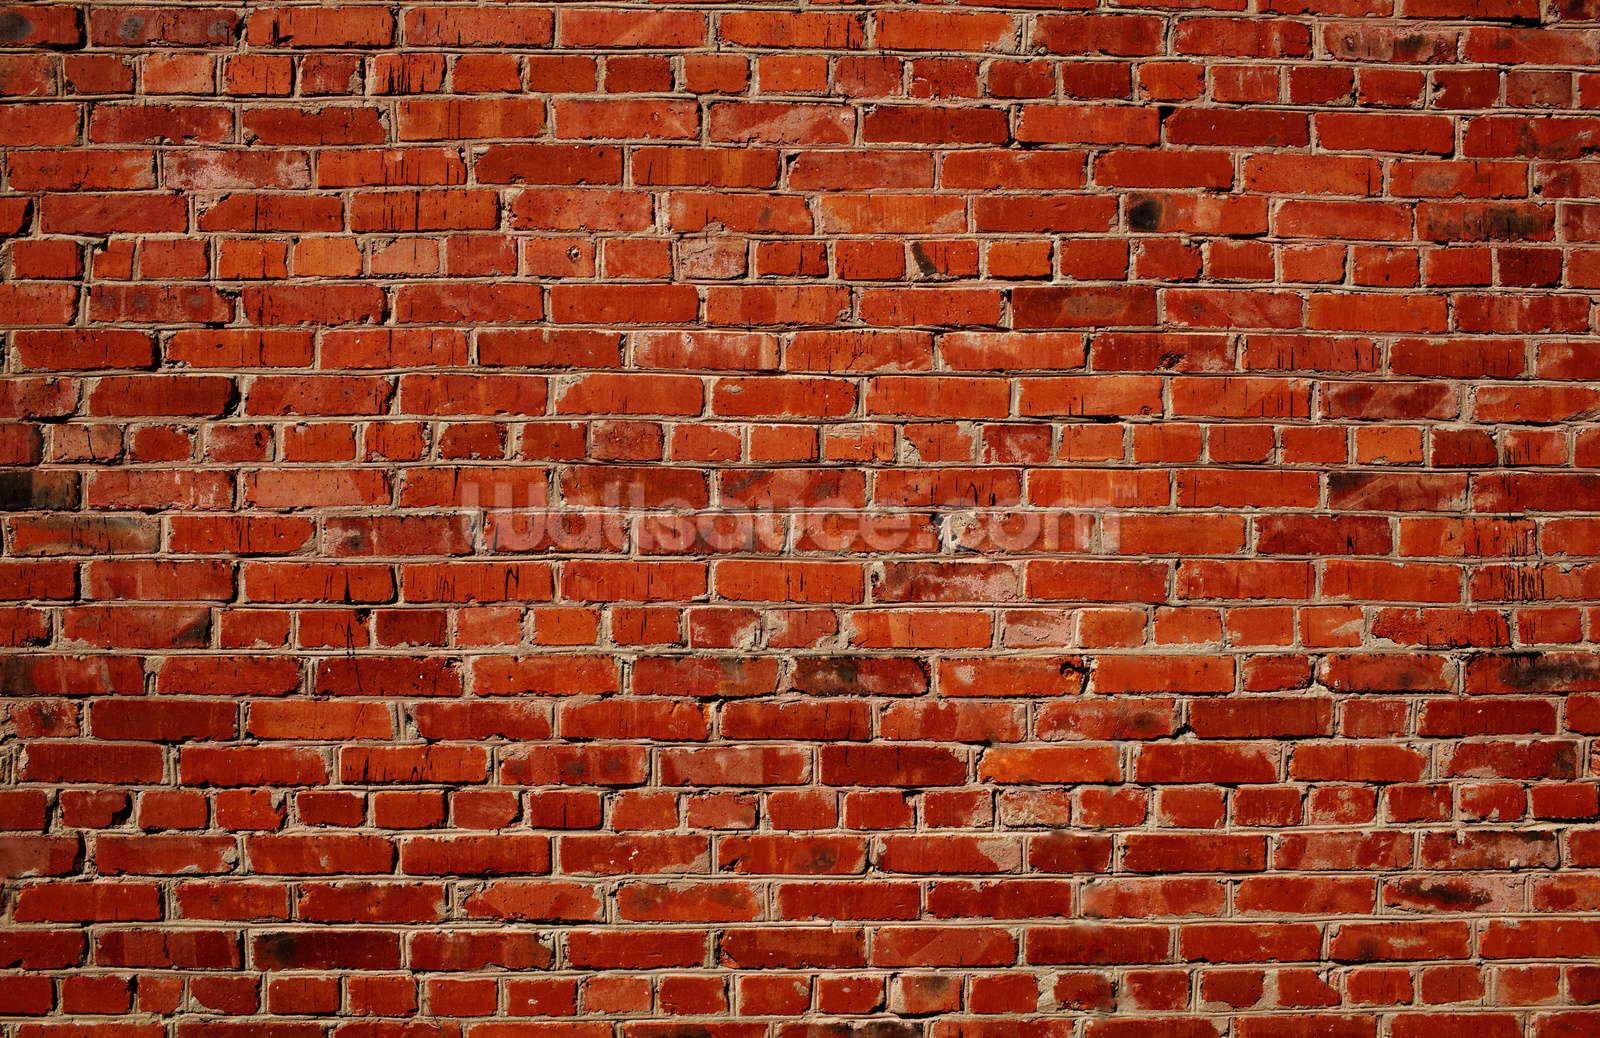 Red Brick Wall - Red Brick Wall Background - HD Wallpaper